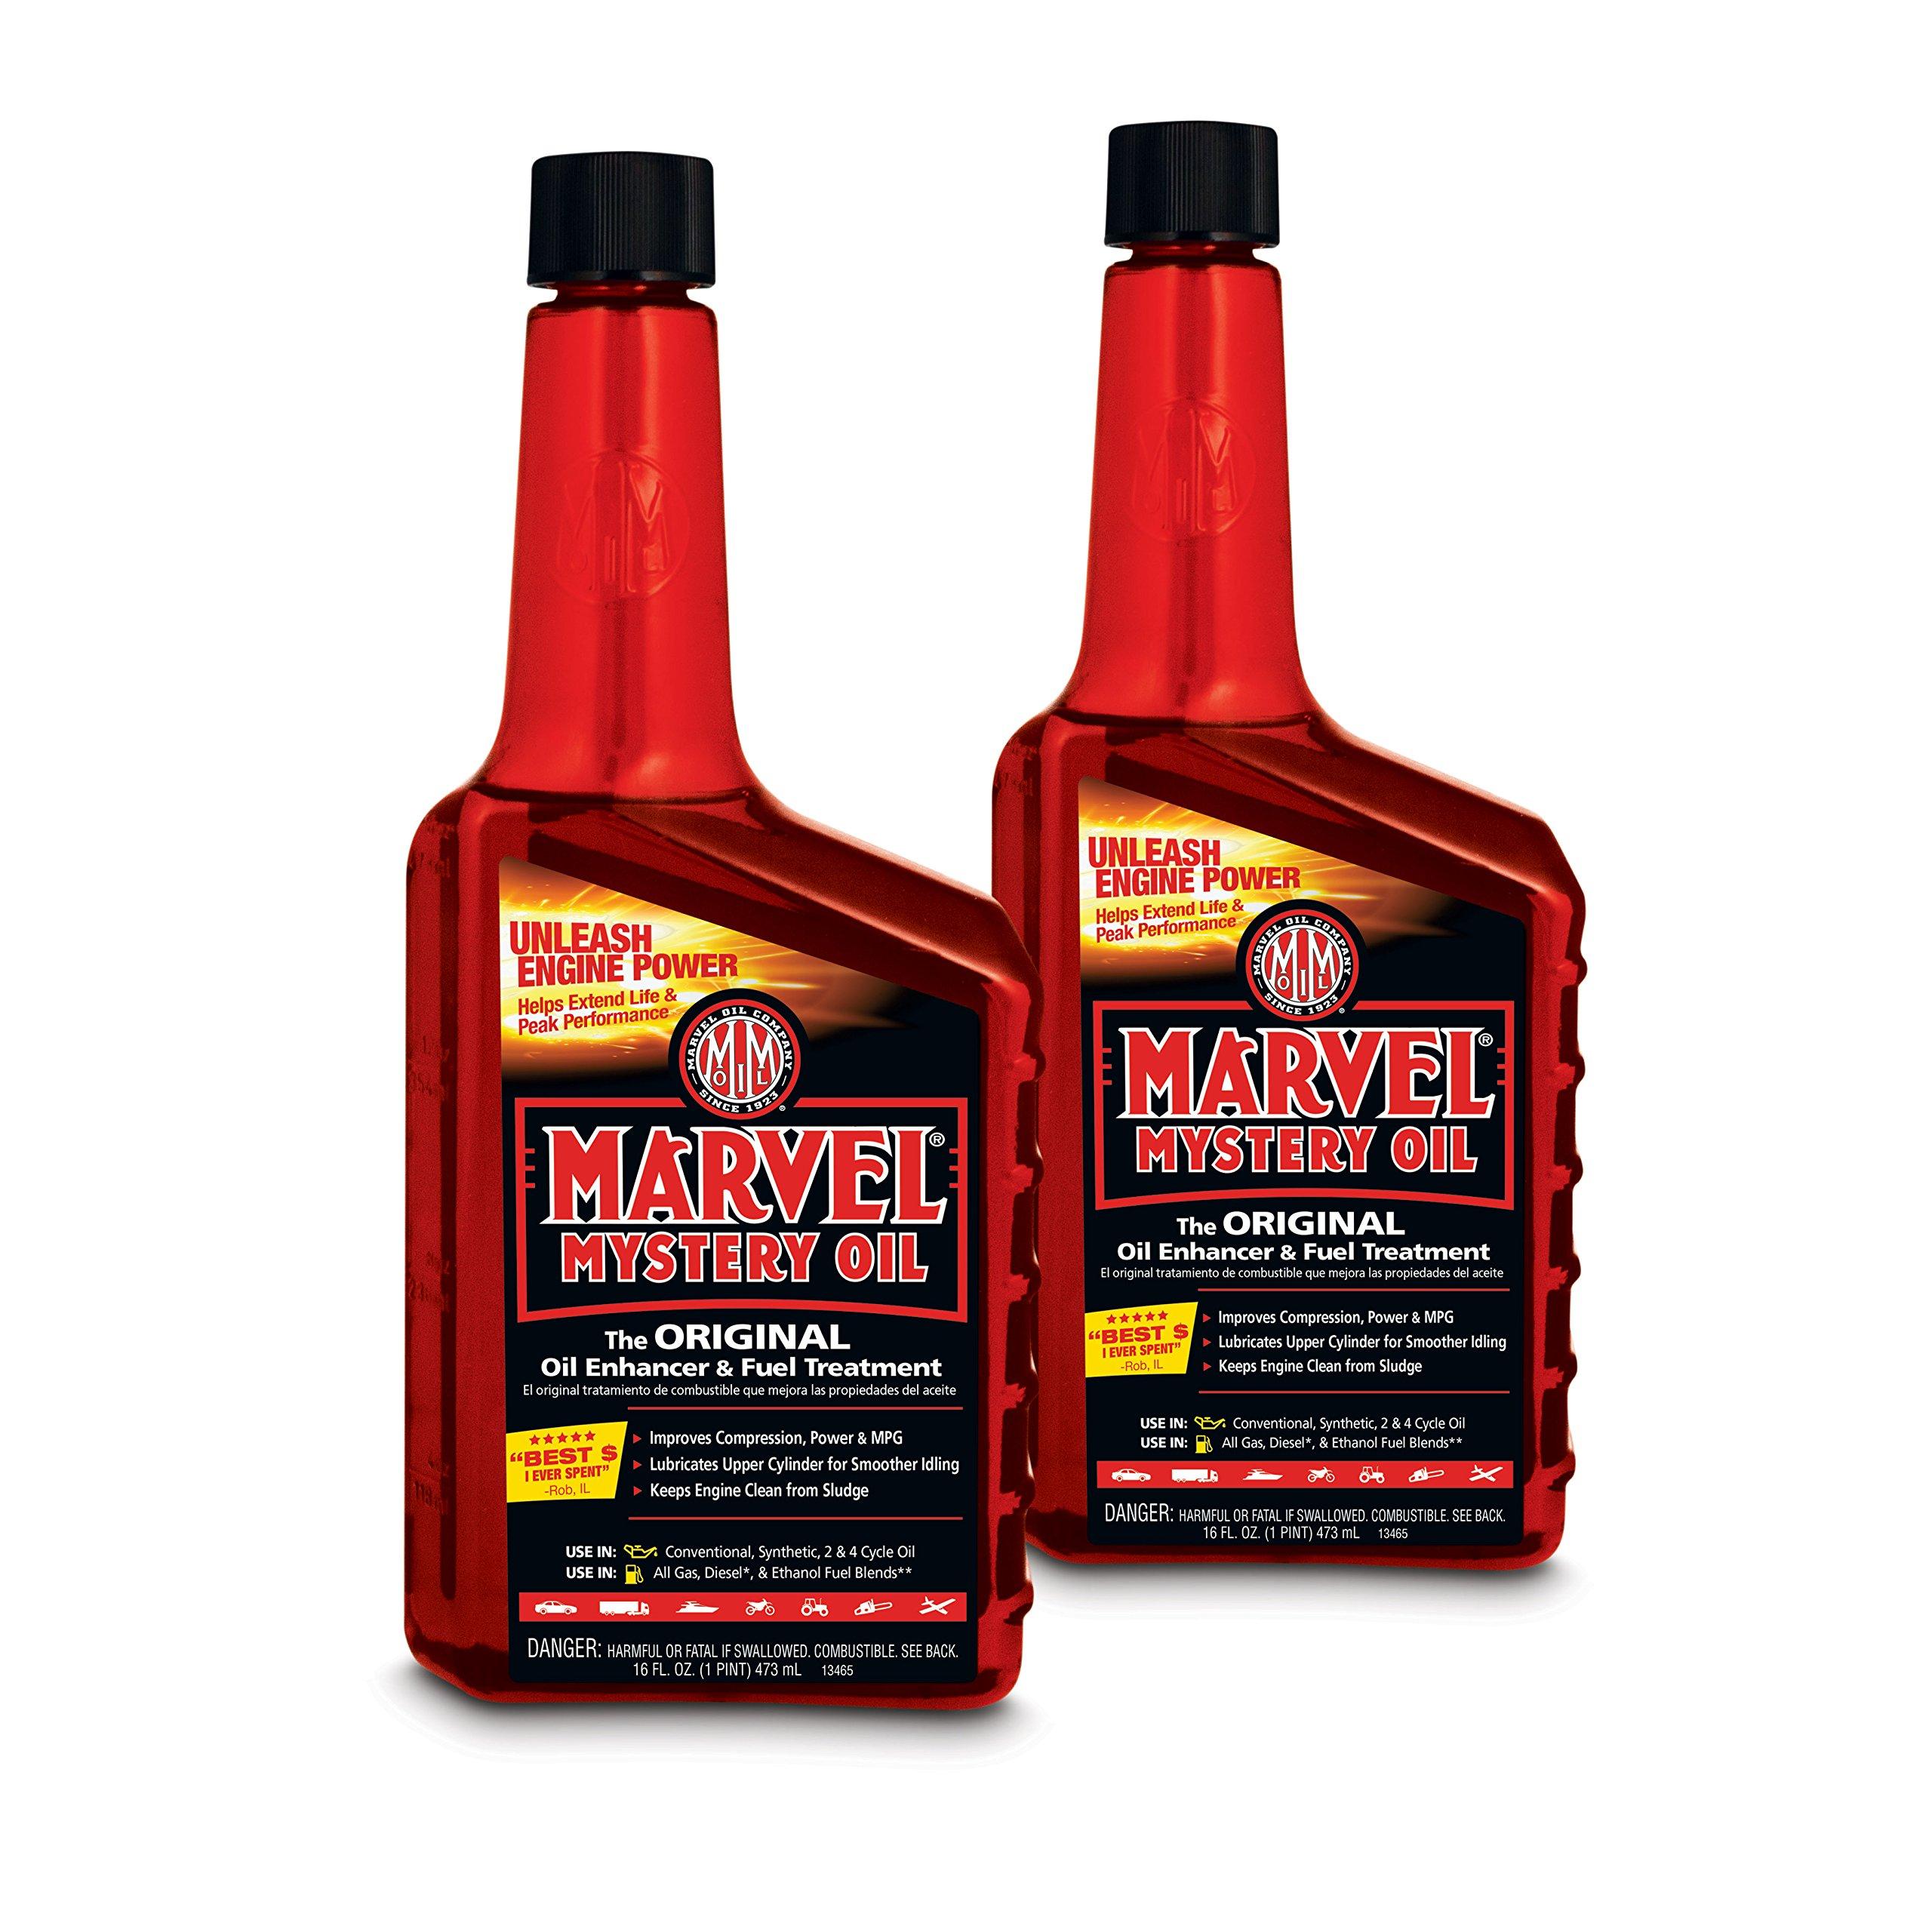 Marvel Mystery Oil 50721 Red MM12R Mystery Oil, 2 Pack (16 oz),